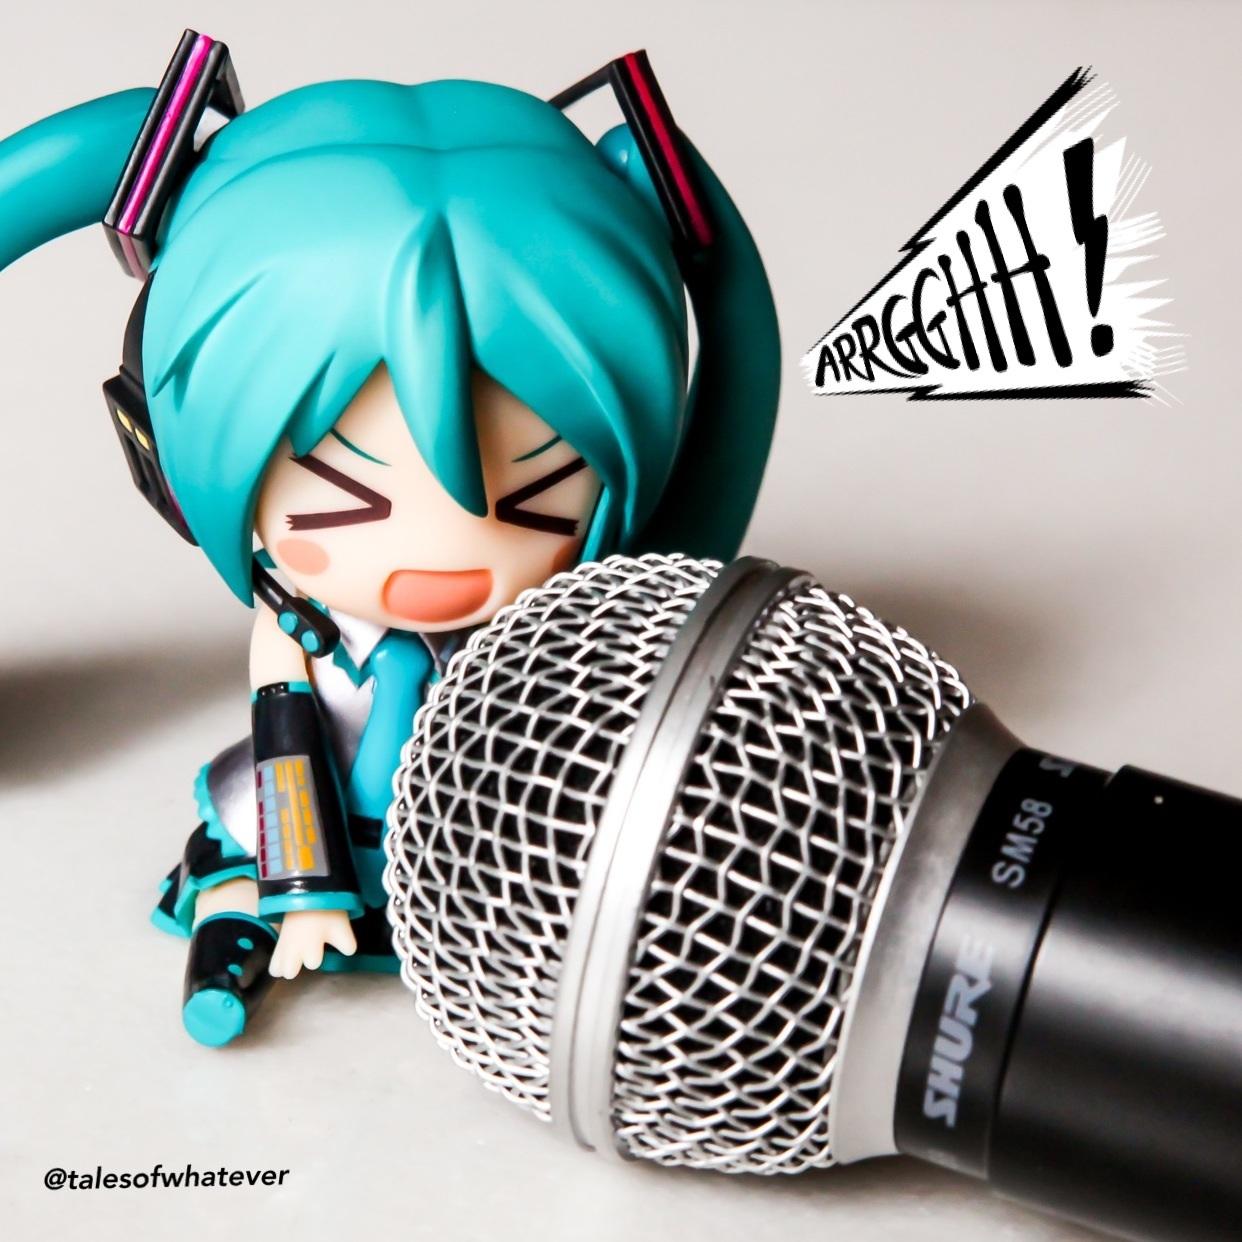 vocaloid sega nendoroid hatsune_miku good_smile_company nendoron katou_gaku crypton_future_media project_mirai shure_microphone